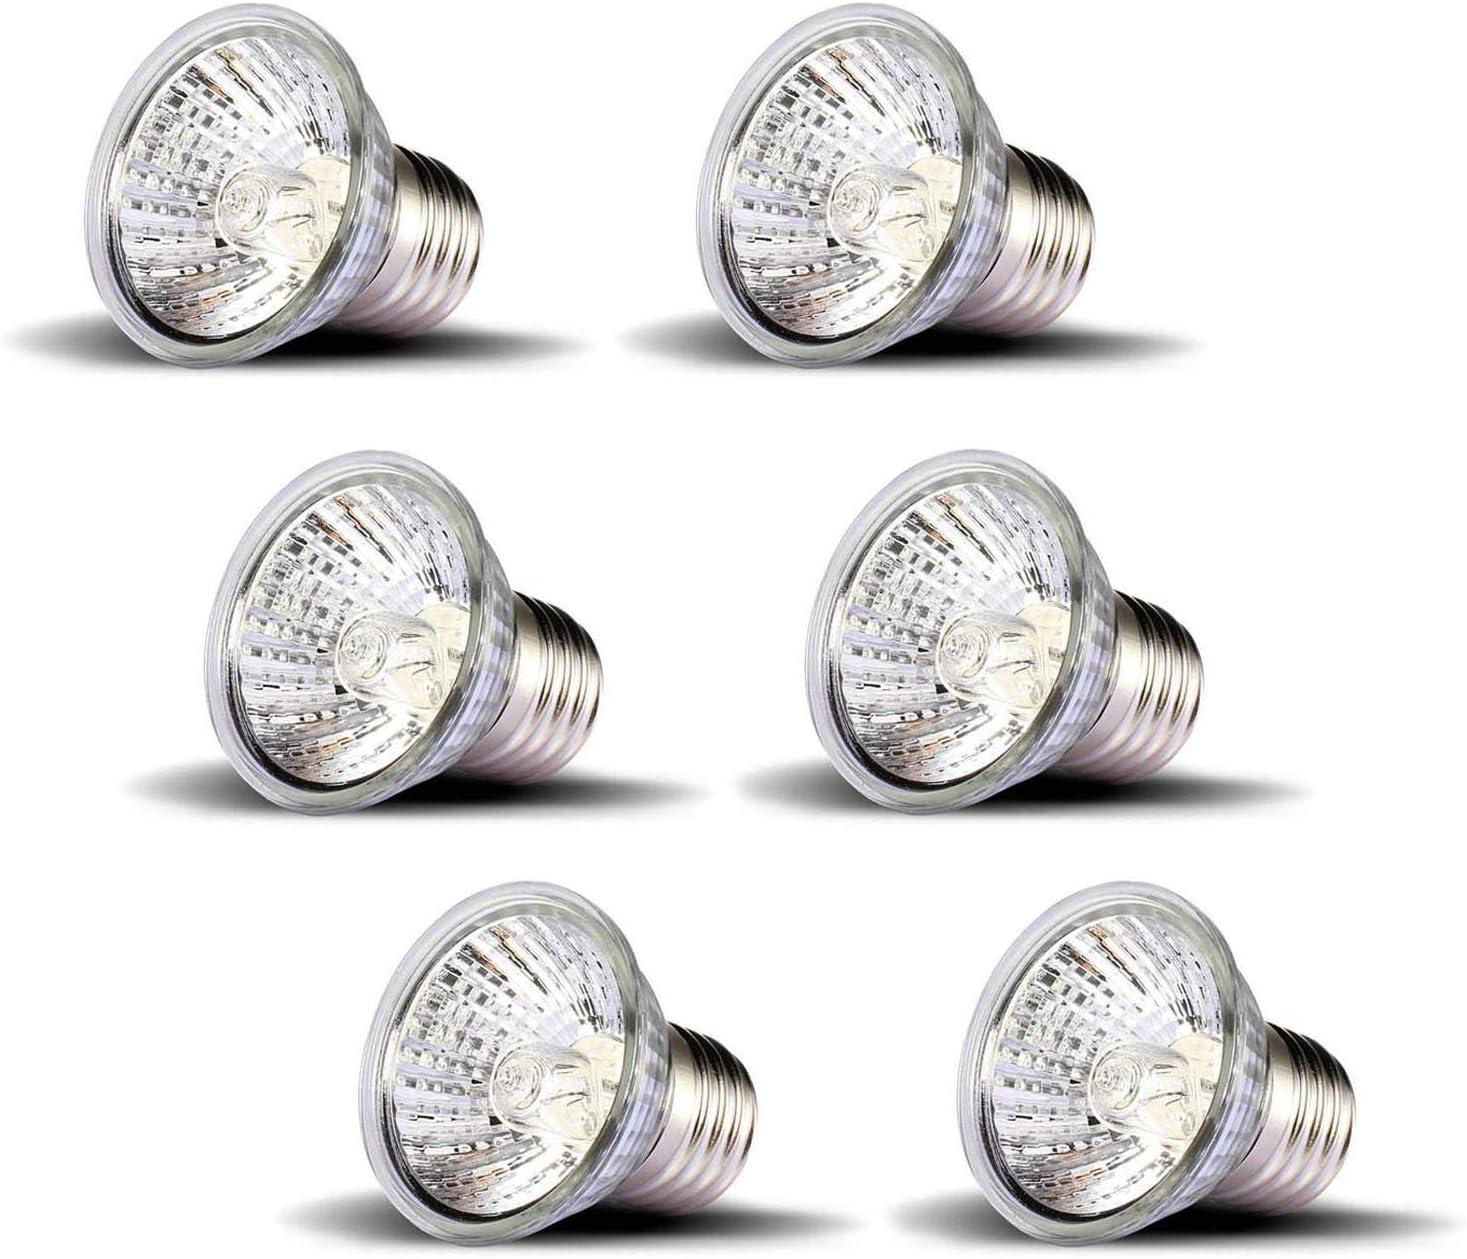 OMAYKEY 50W 6 Pack UVA + UVB Full Spectrum Sun Lamp Sunbathe Heat Lamp/Bulb/Light for Lizard Reptiles and Amphibians